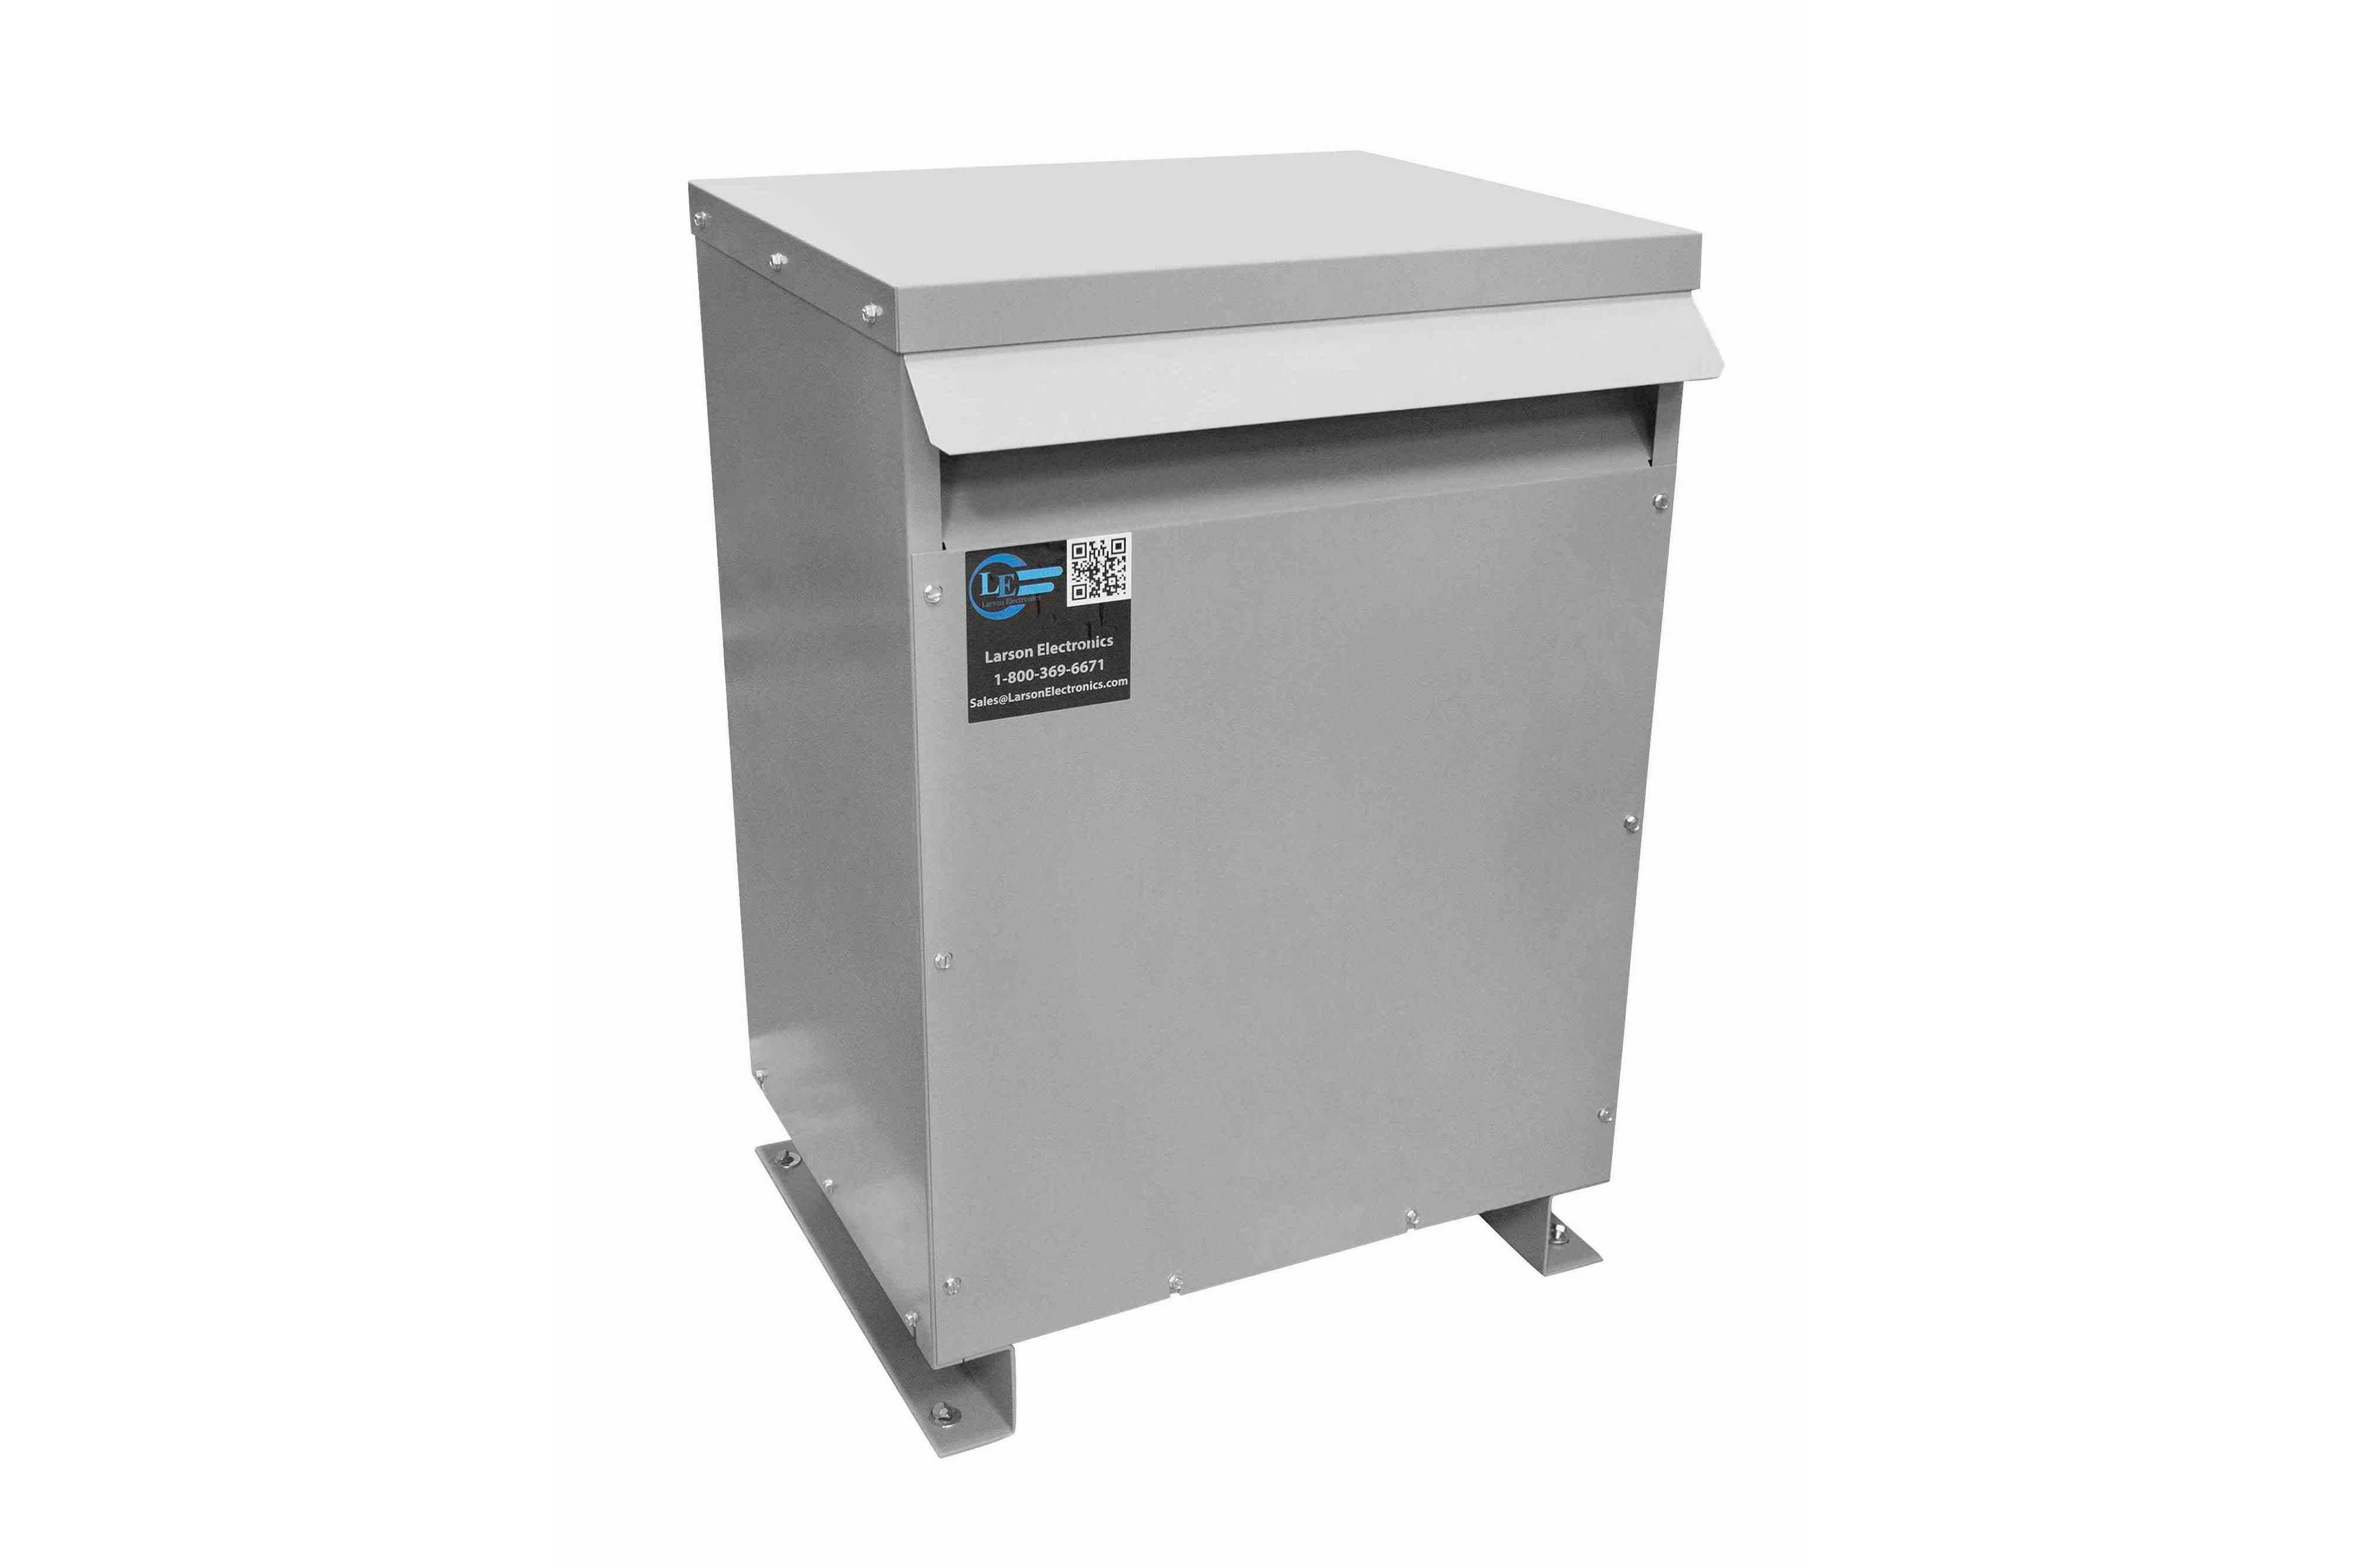 800 kVA 3PH Isolation Transformer, 600V Wye Primary, 460V Delta Secondary, N3R, Ventilated, 60 Hz